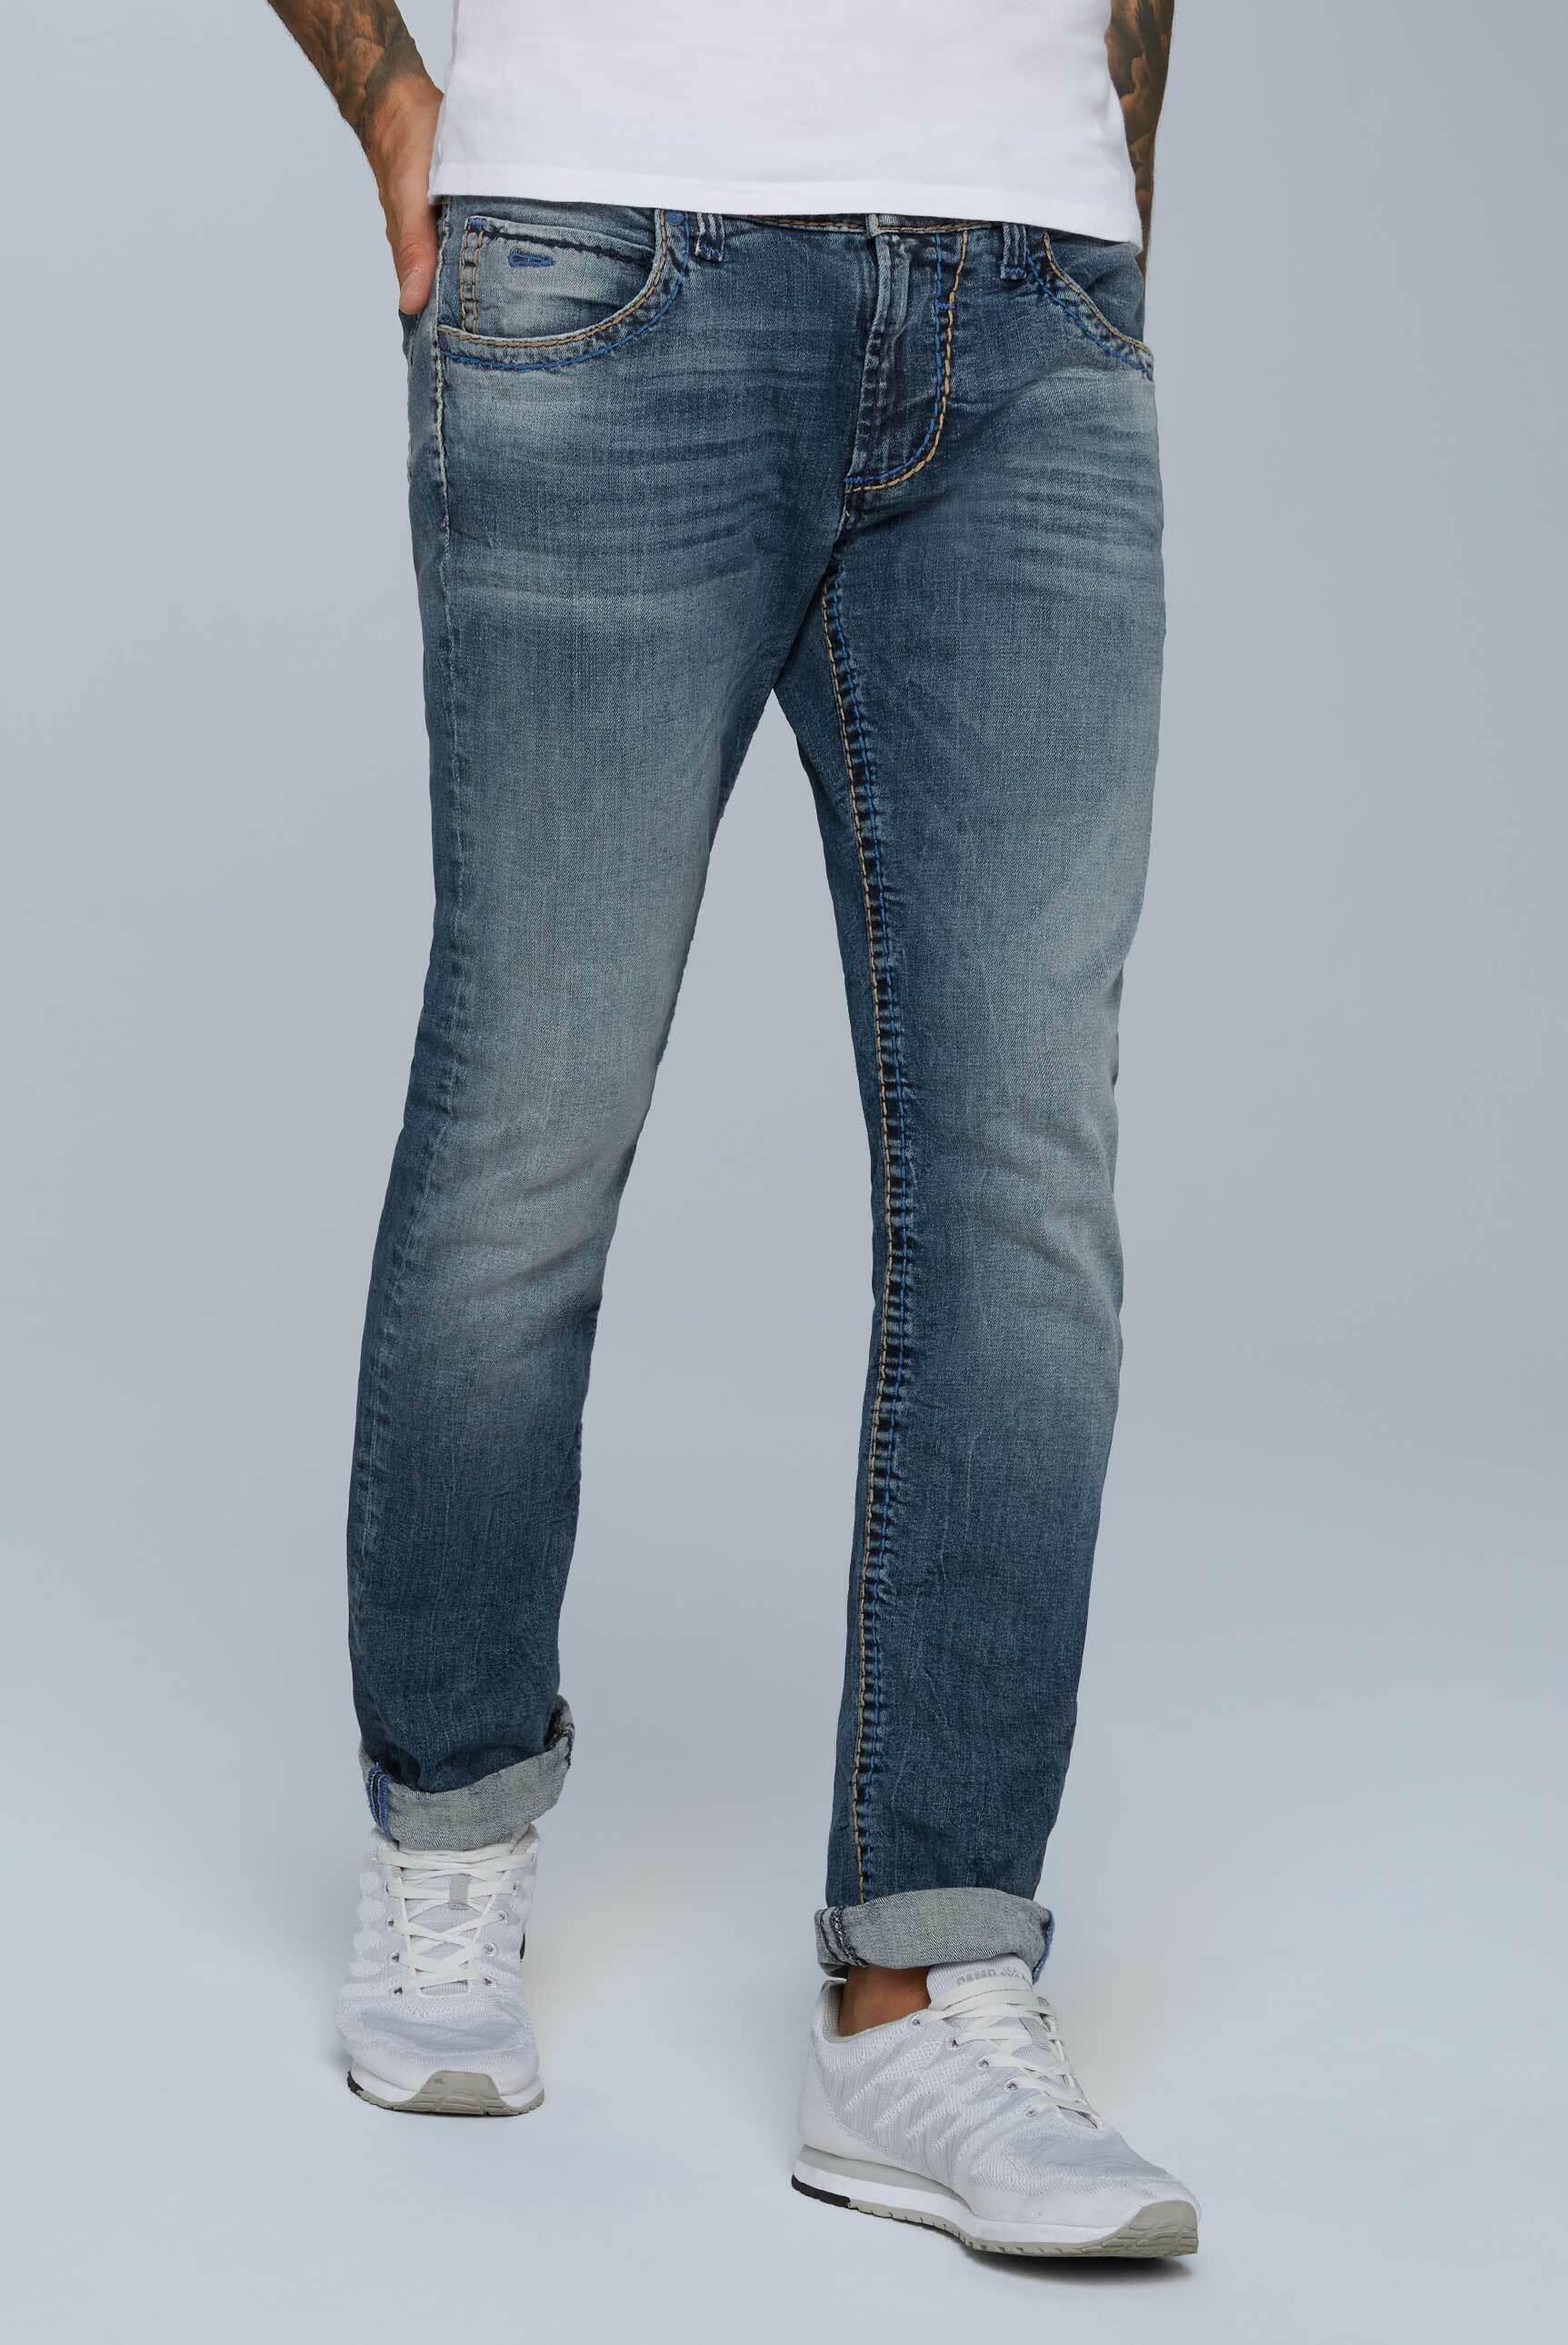 Jeans NI:CO mit farbigen Nähten